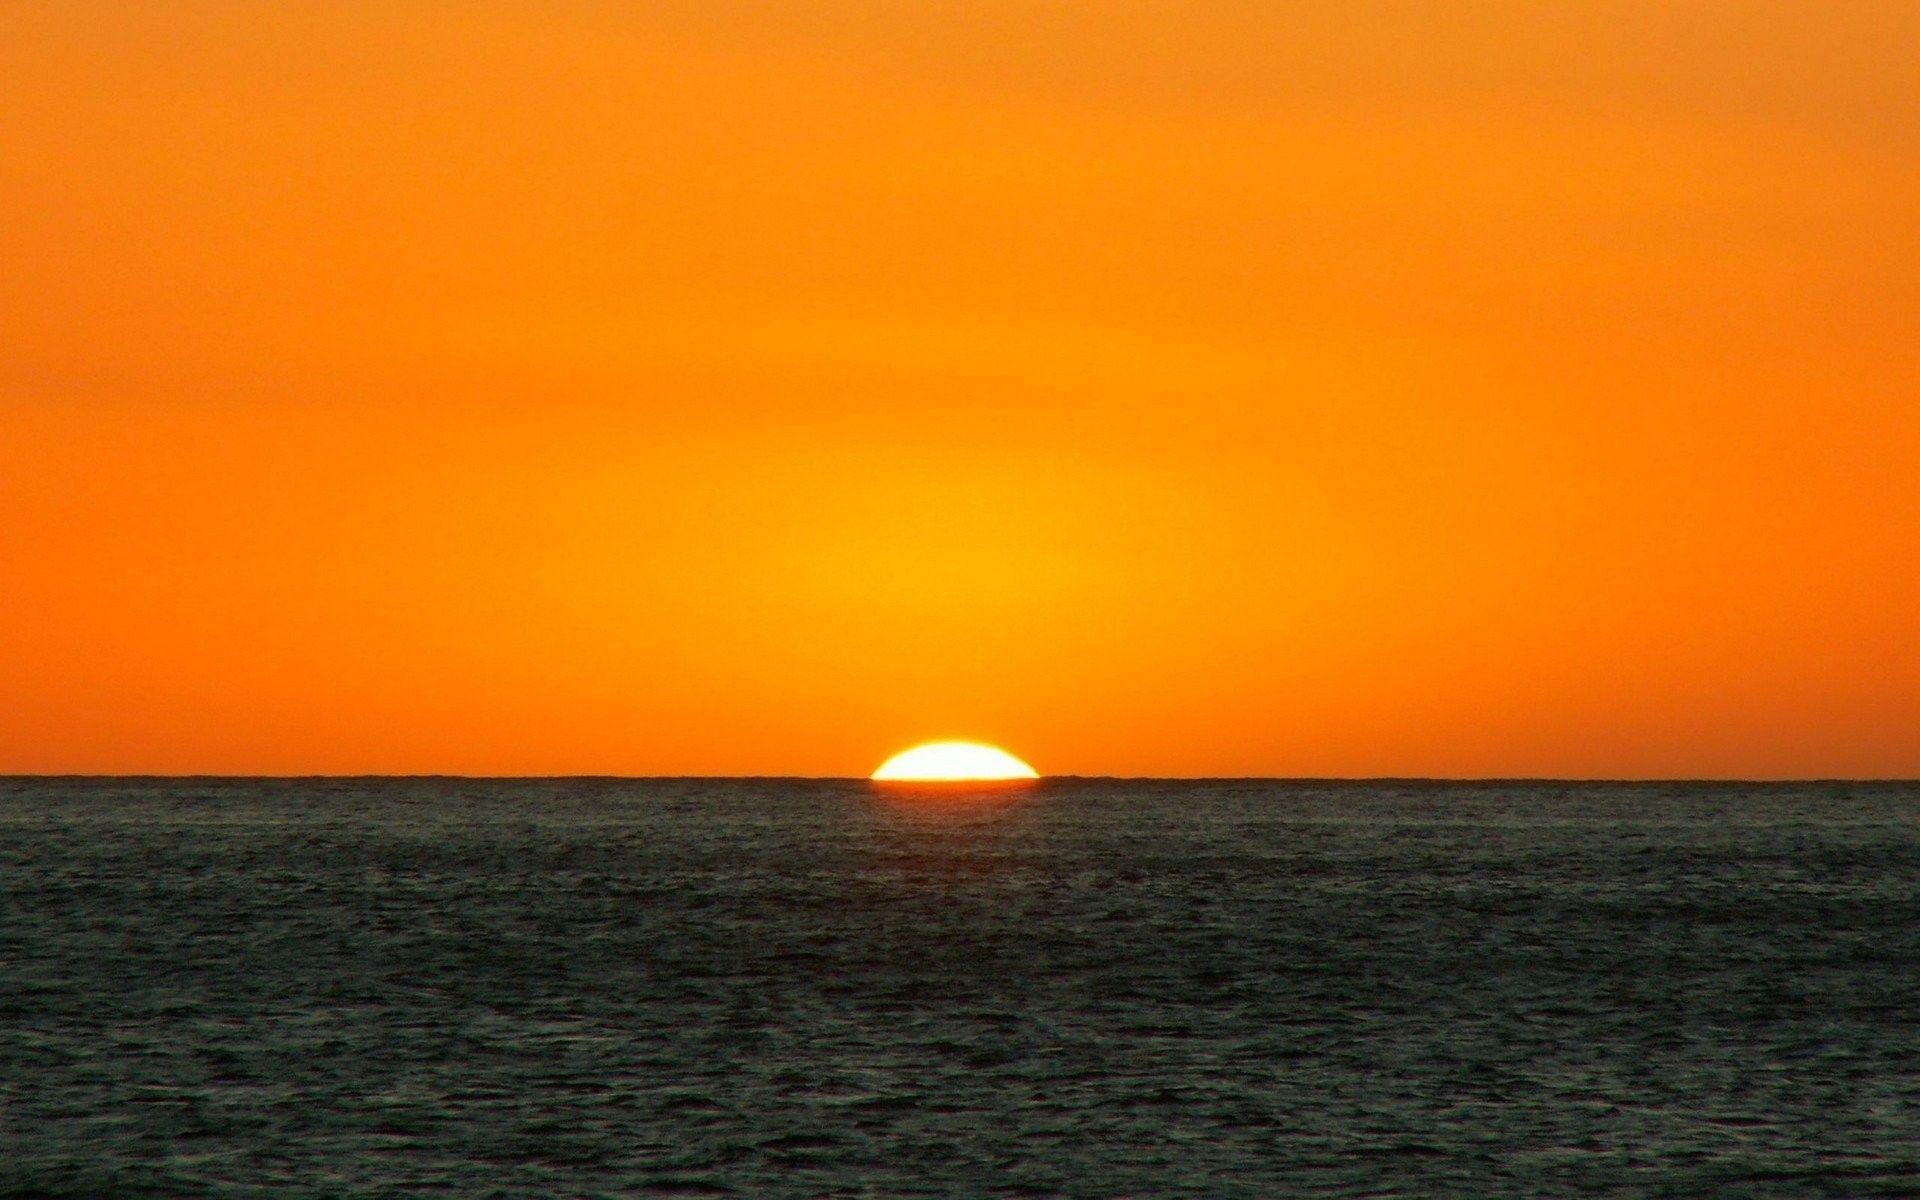 End Summer Orange Black Sunset Sunshine Ocean Beach Yellow Seamwater Days Desktop Backgrounds Sunsets End Summer Oran Sunset Sunset Landscape Sunset Pictures